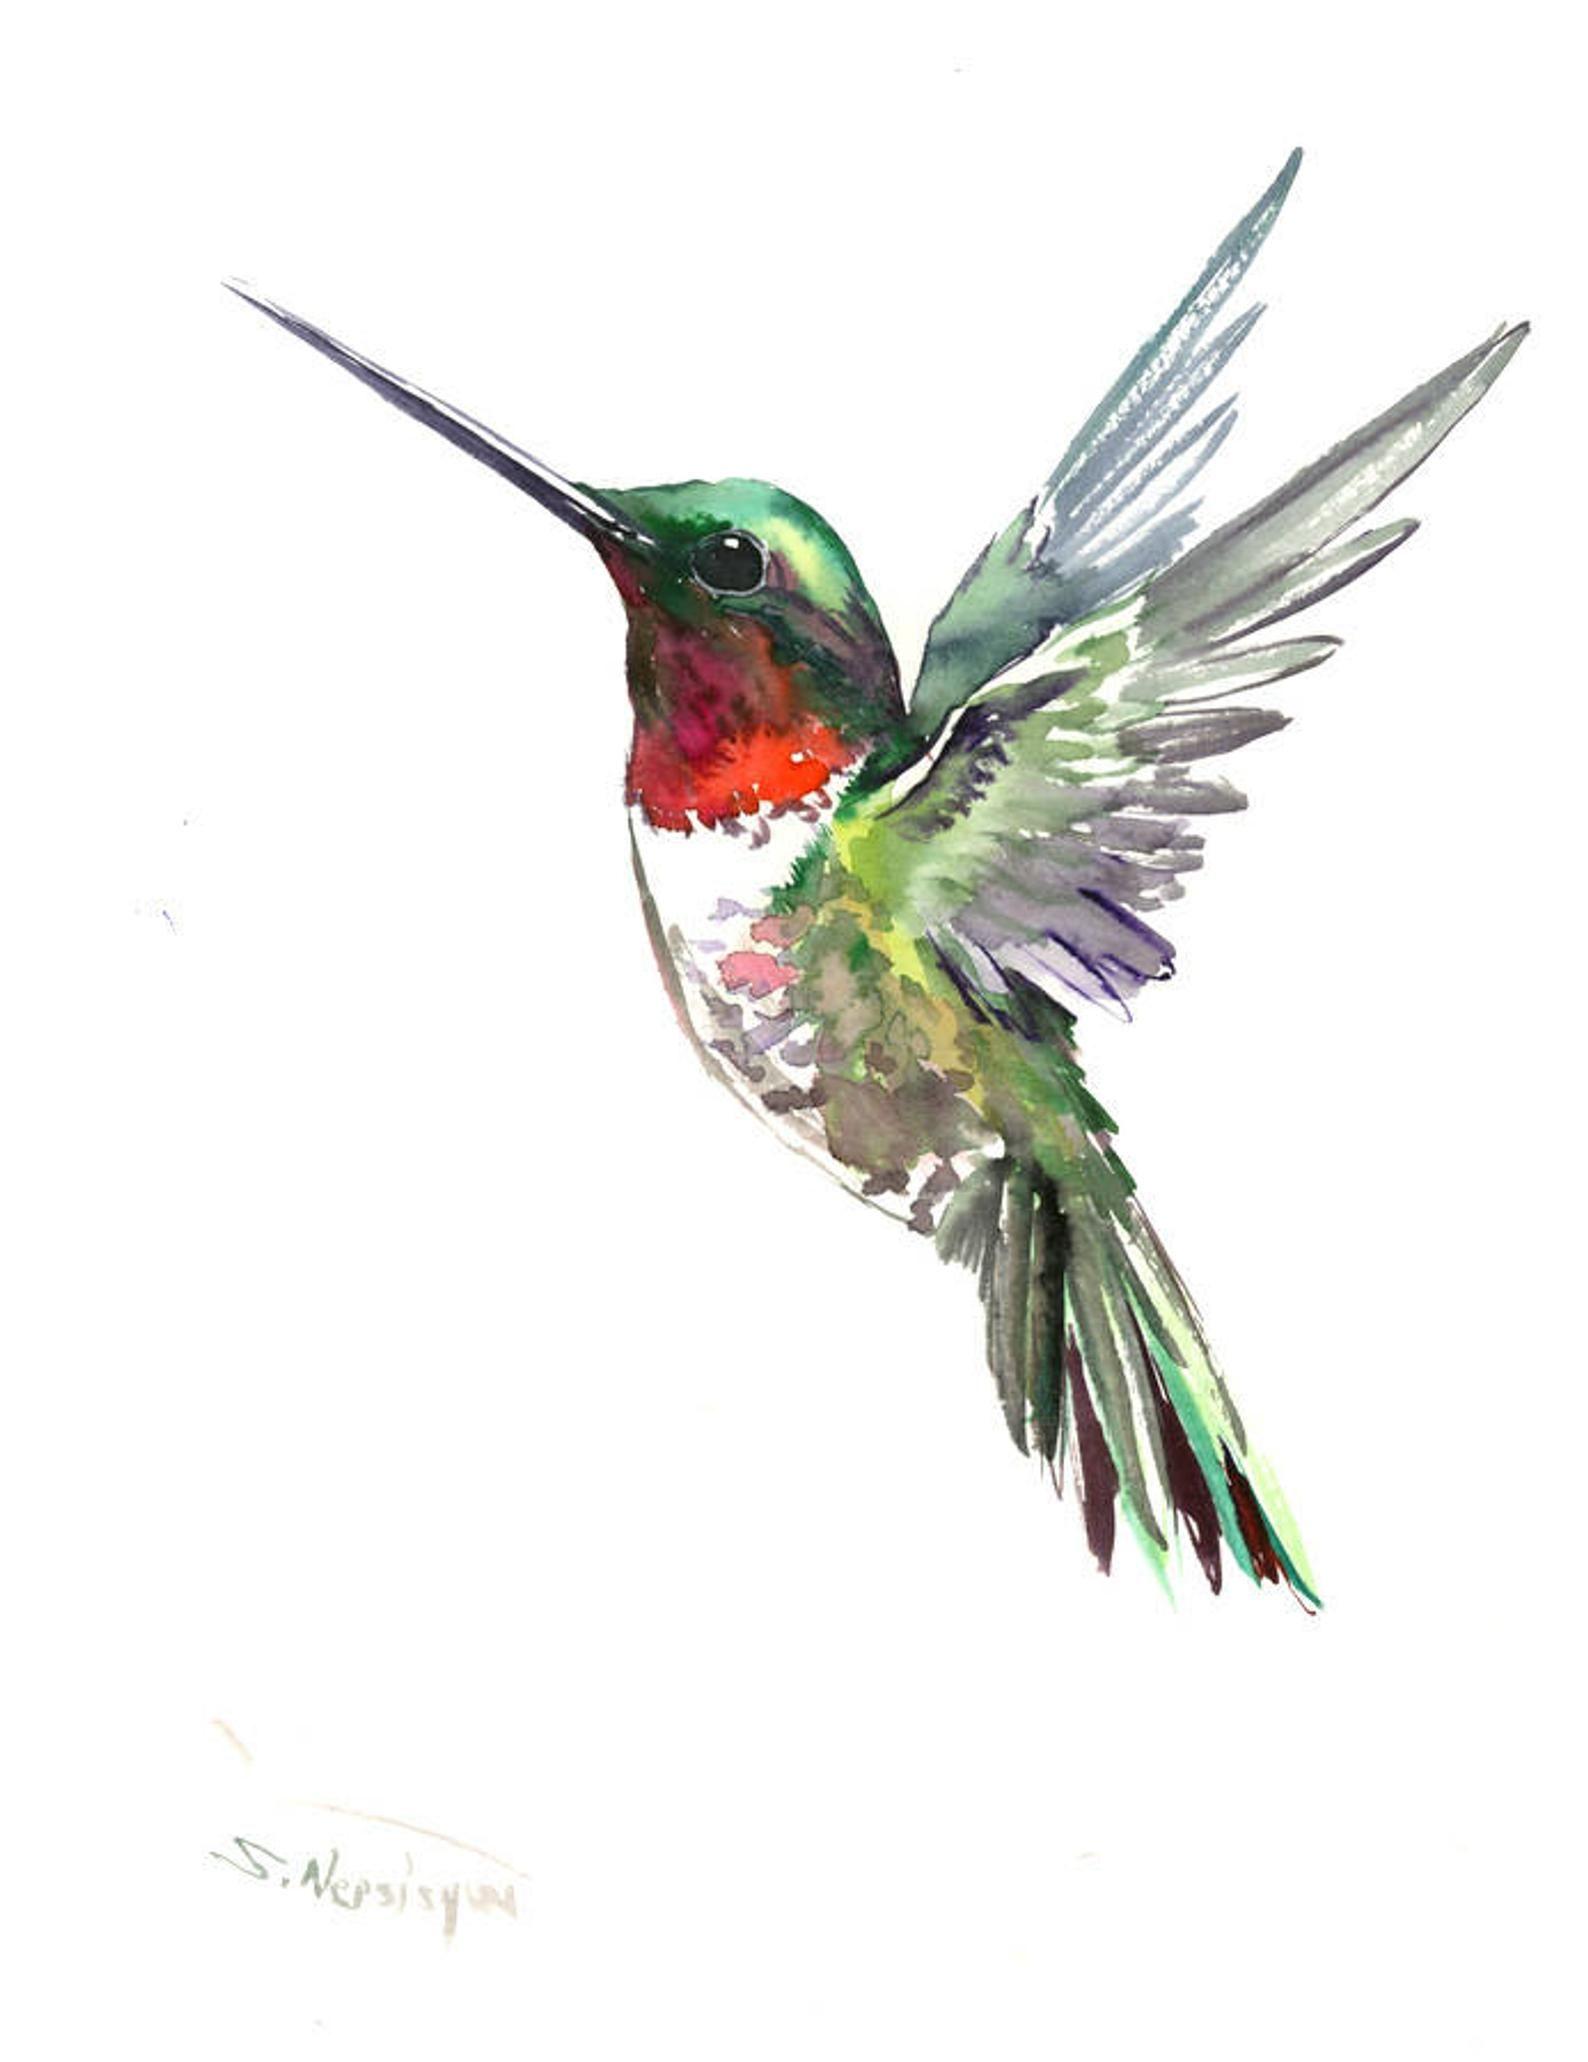 Hummingbird painting | Etsy | Hummingbird painting, Watercolor hummingbird,  Hummingbird art